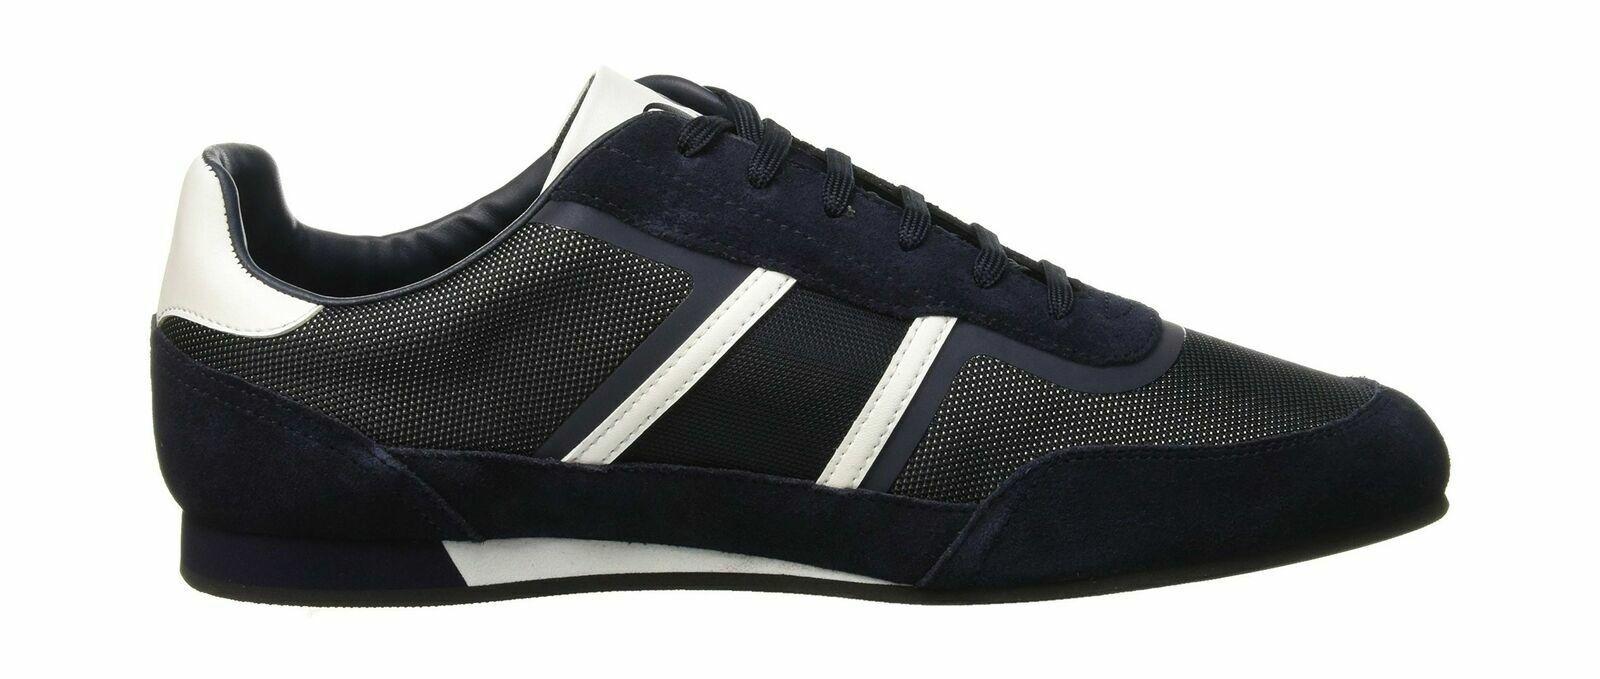 NEW Hugo Boss shoes Lighter_Lowp_Flash2 Sneakers Men bluee 50401838-401